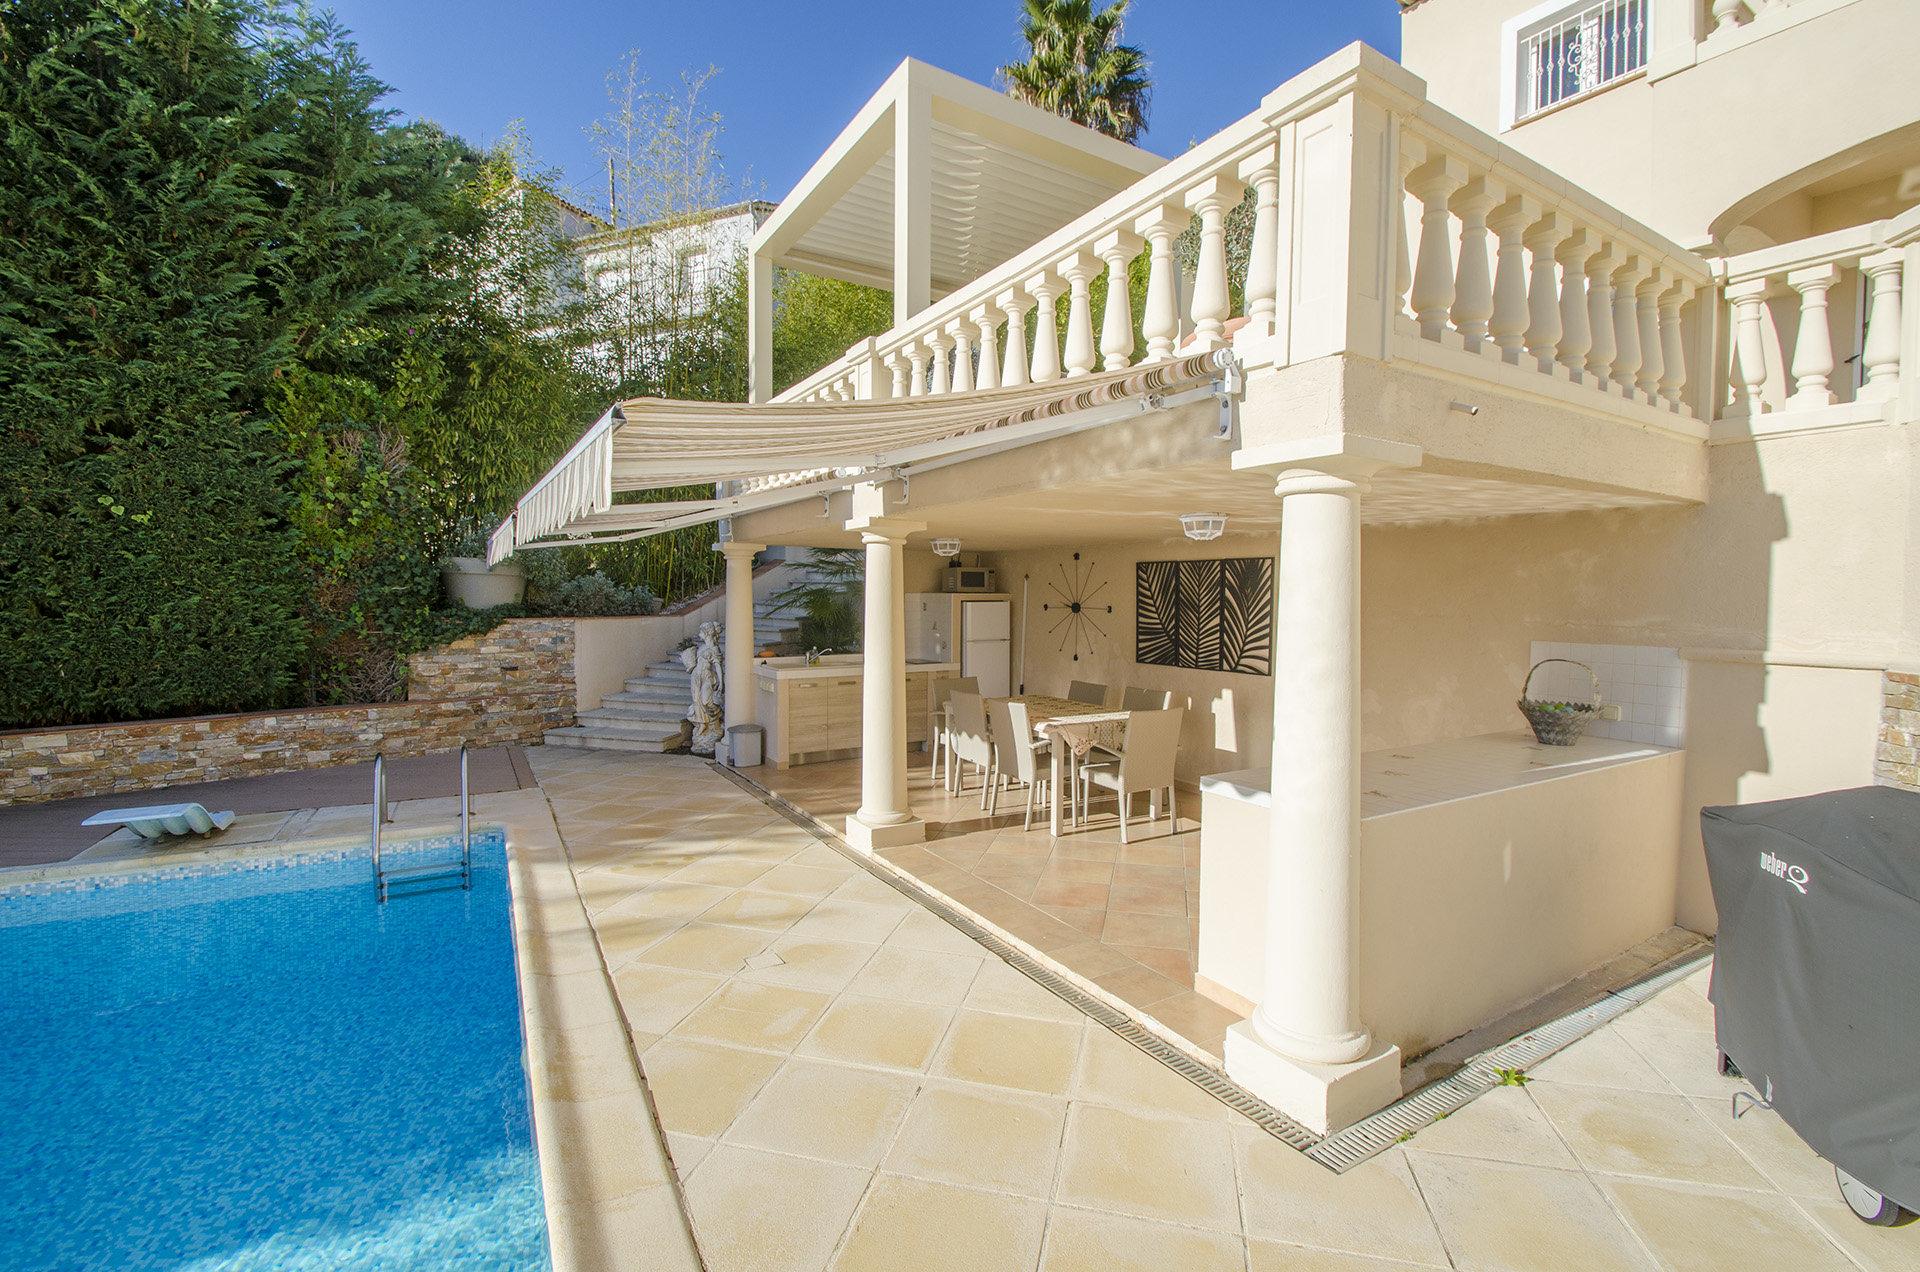 Splendide demeure 4 chambres